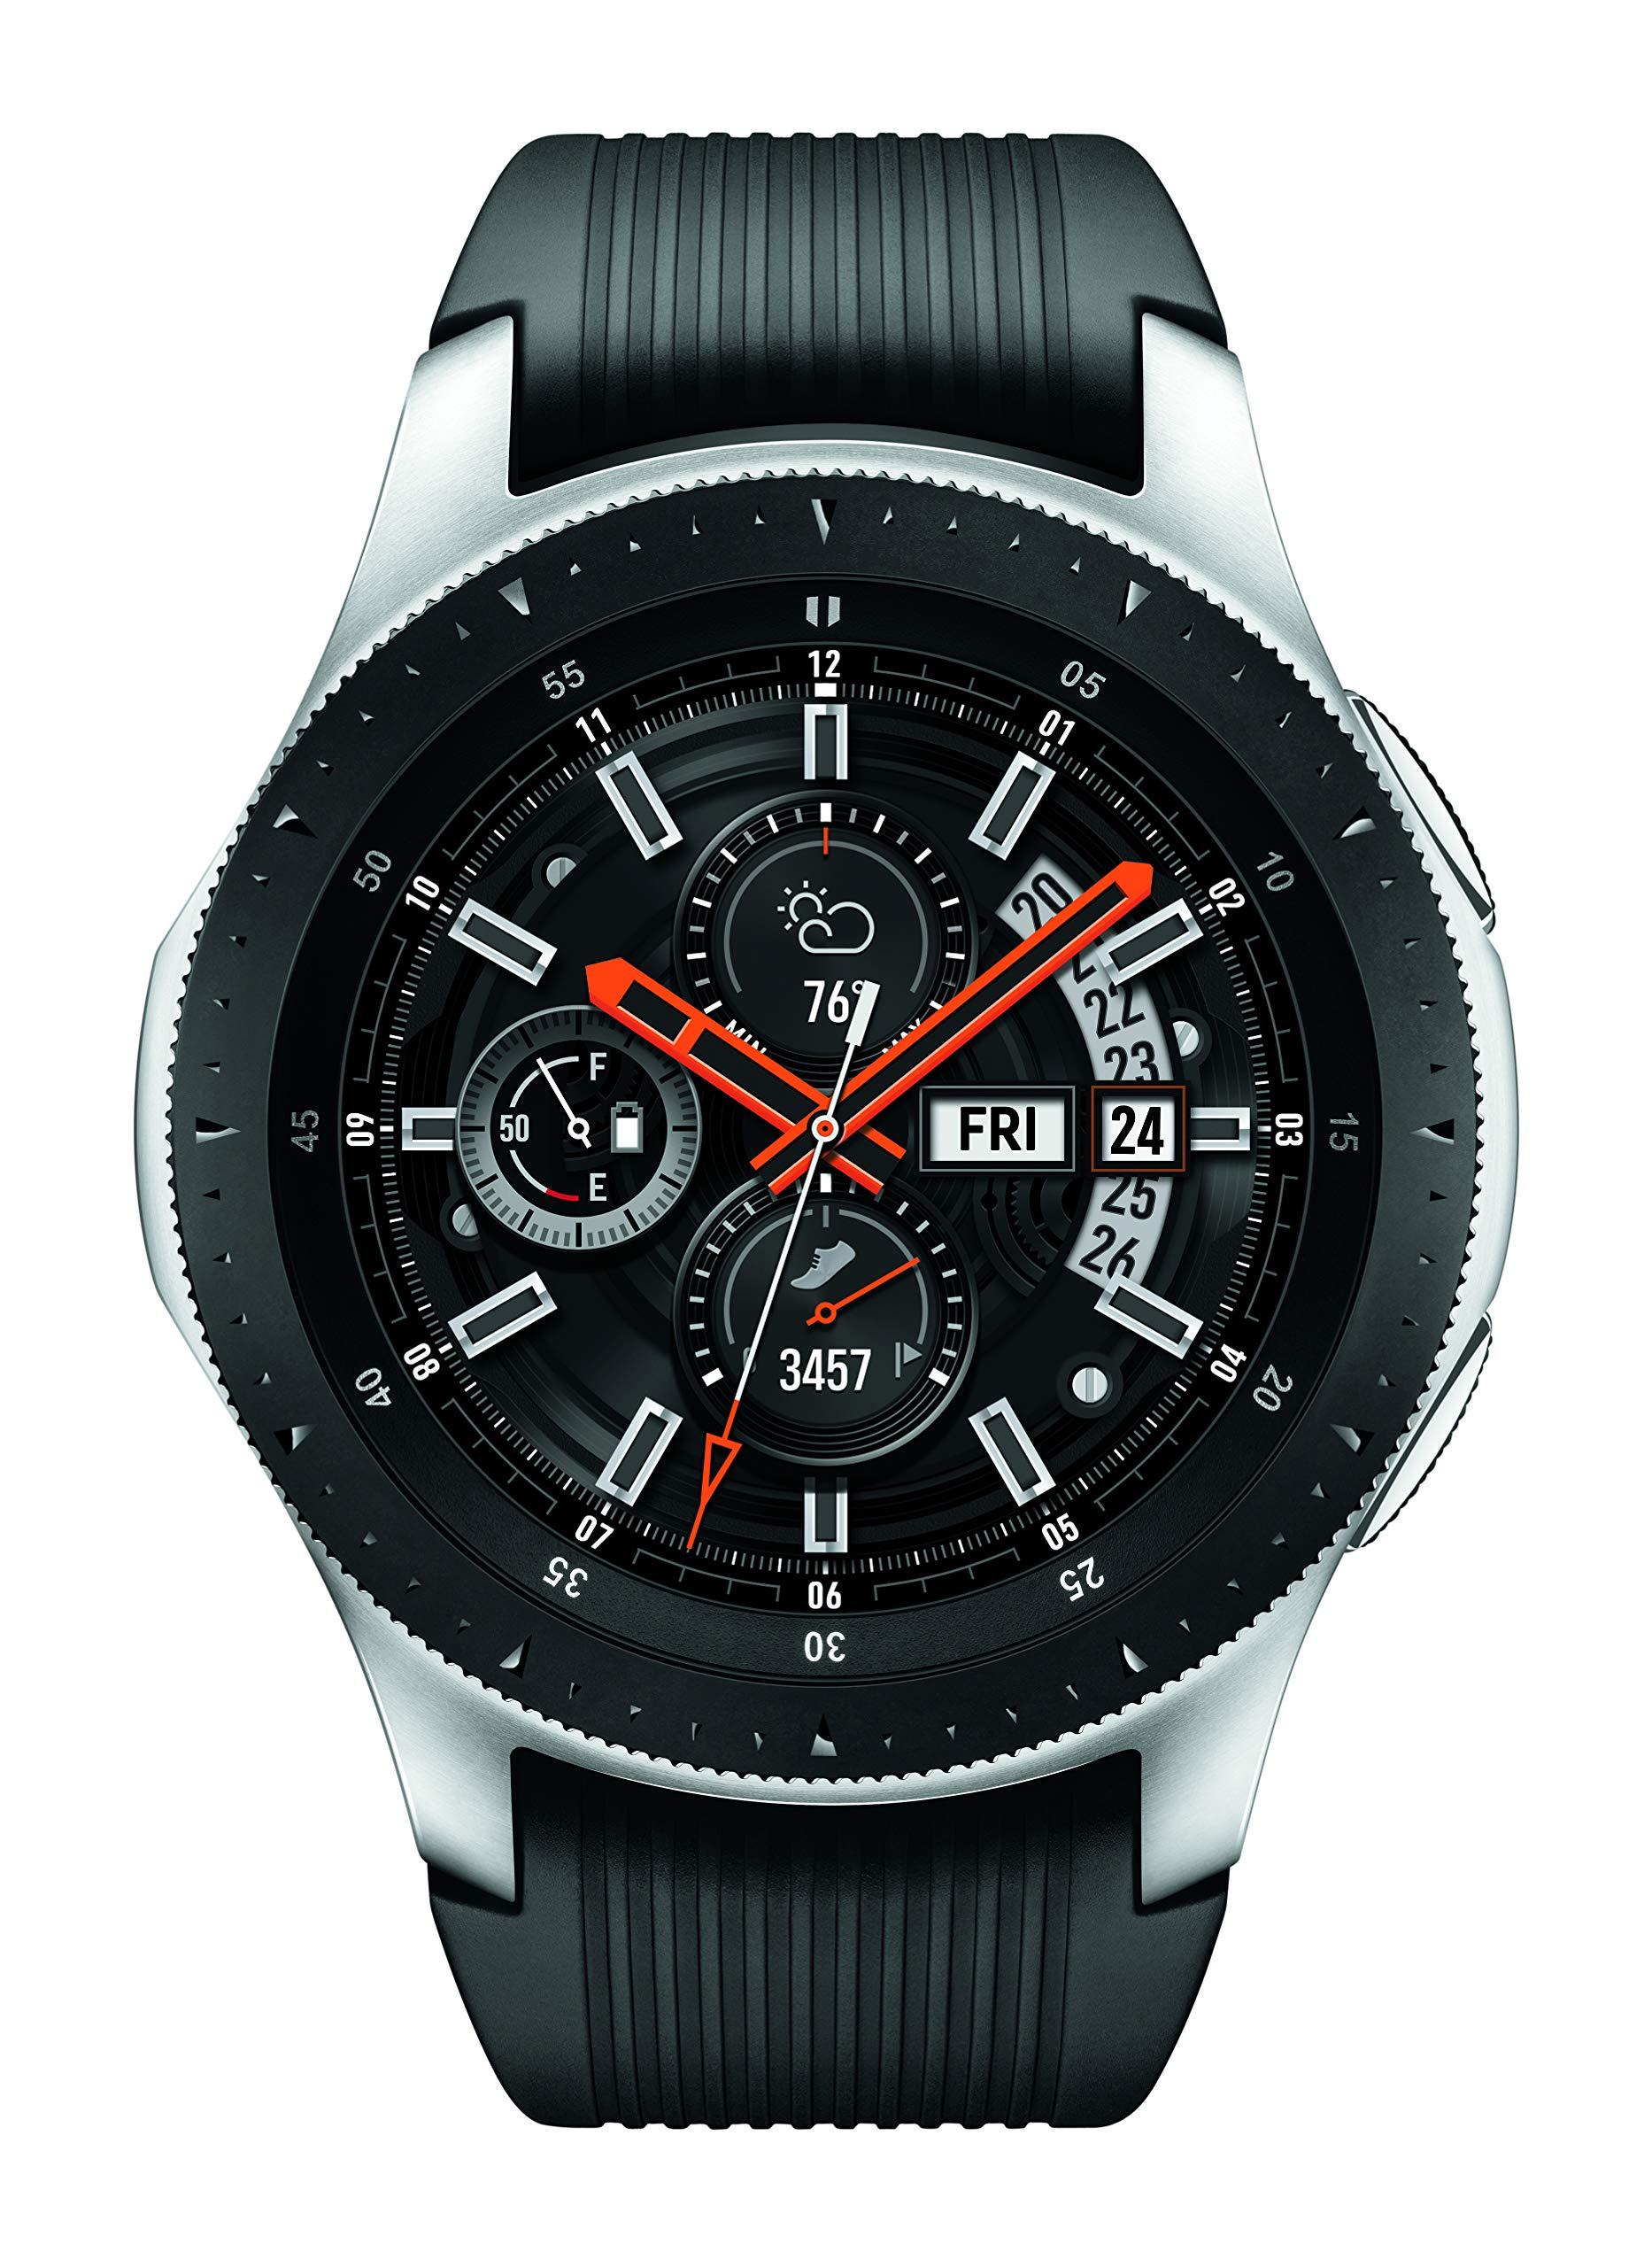 Samsung Galaxy Smartwatch (46mm) Silver (Bluetooth), SM-R800NZSAXAR - US Version with Warranty by Samsung